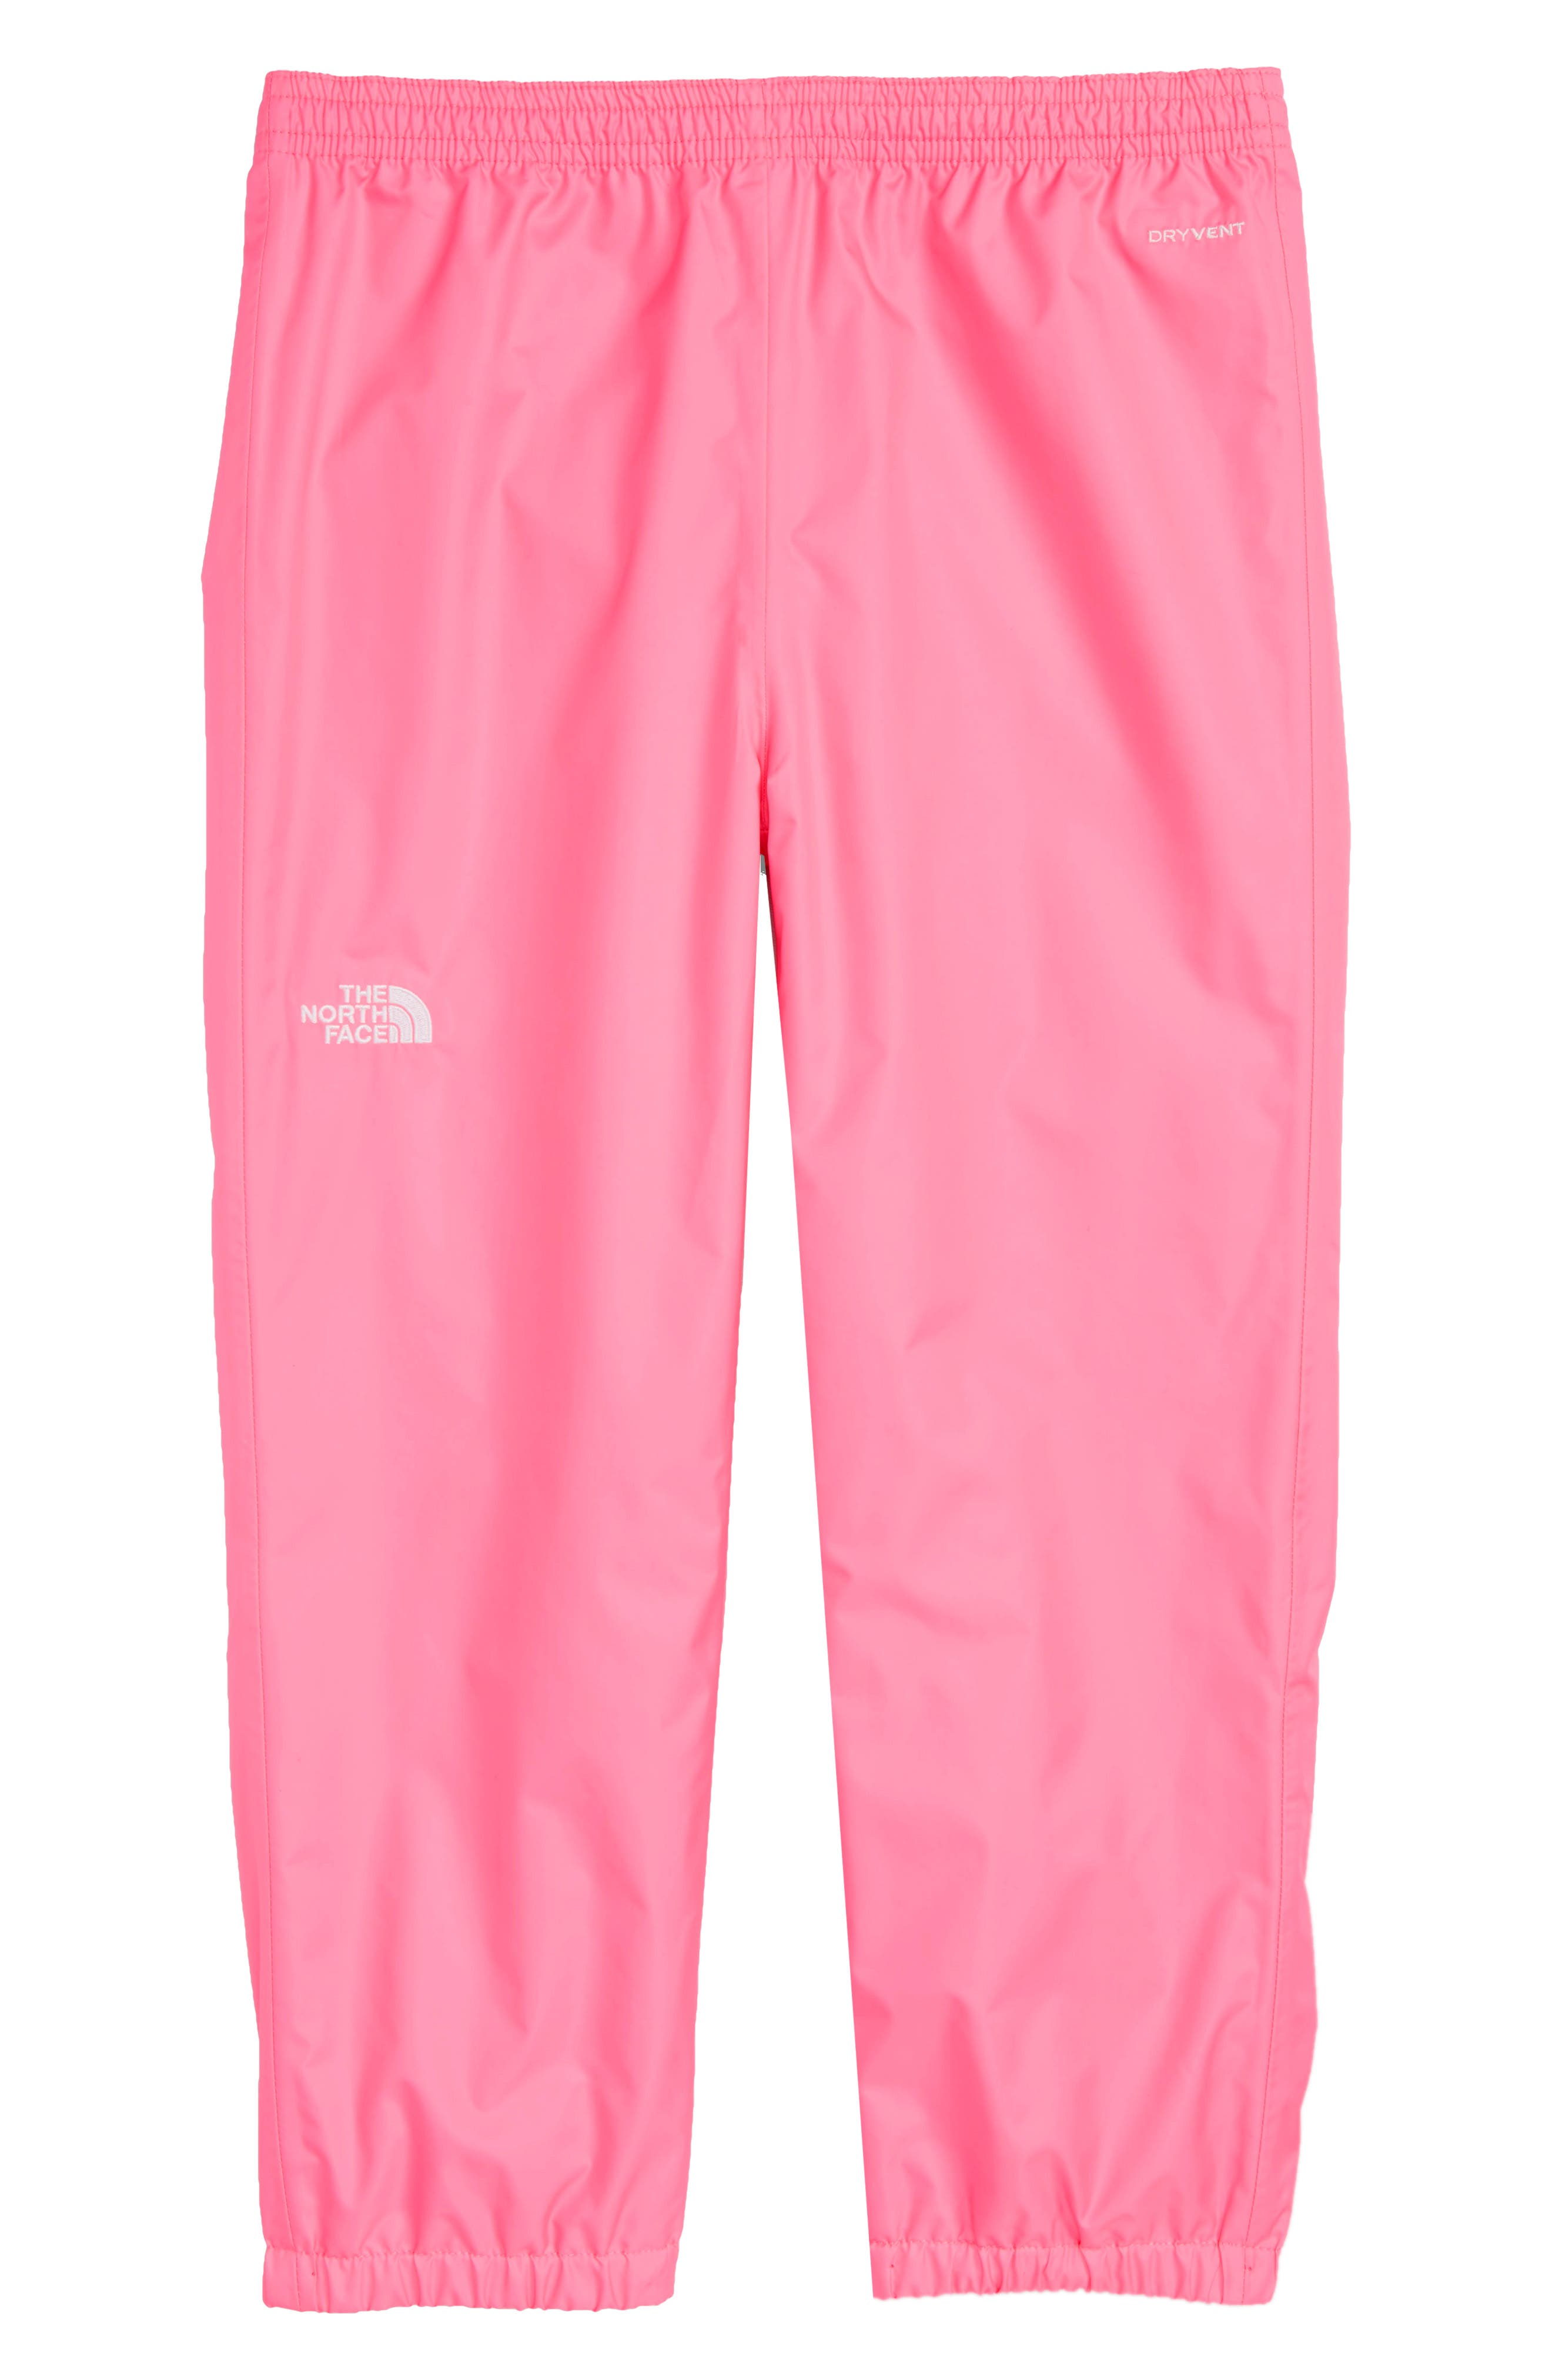 Tailout Waterproof Pants,                         Main,                         color, Gem Pink